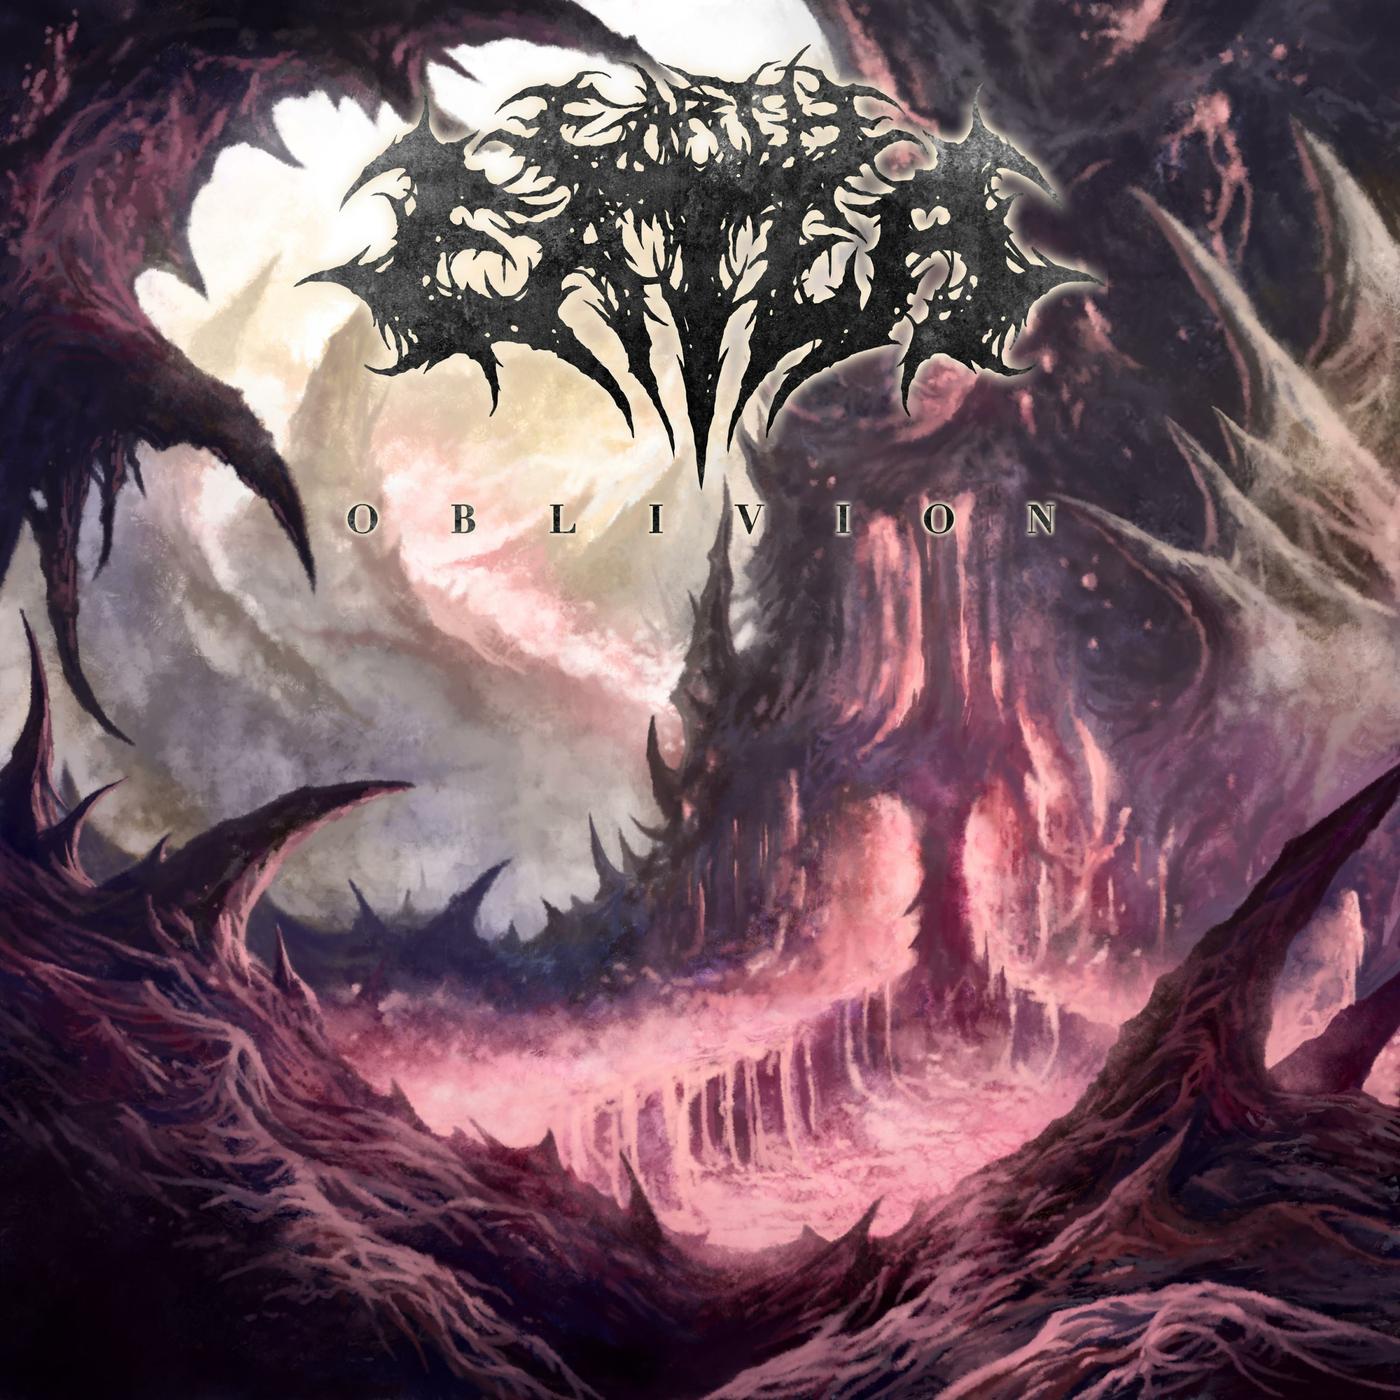 Earth Eater - Oblivion (2018)